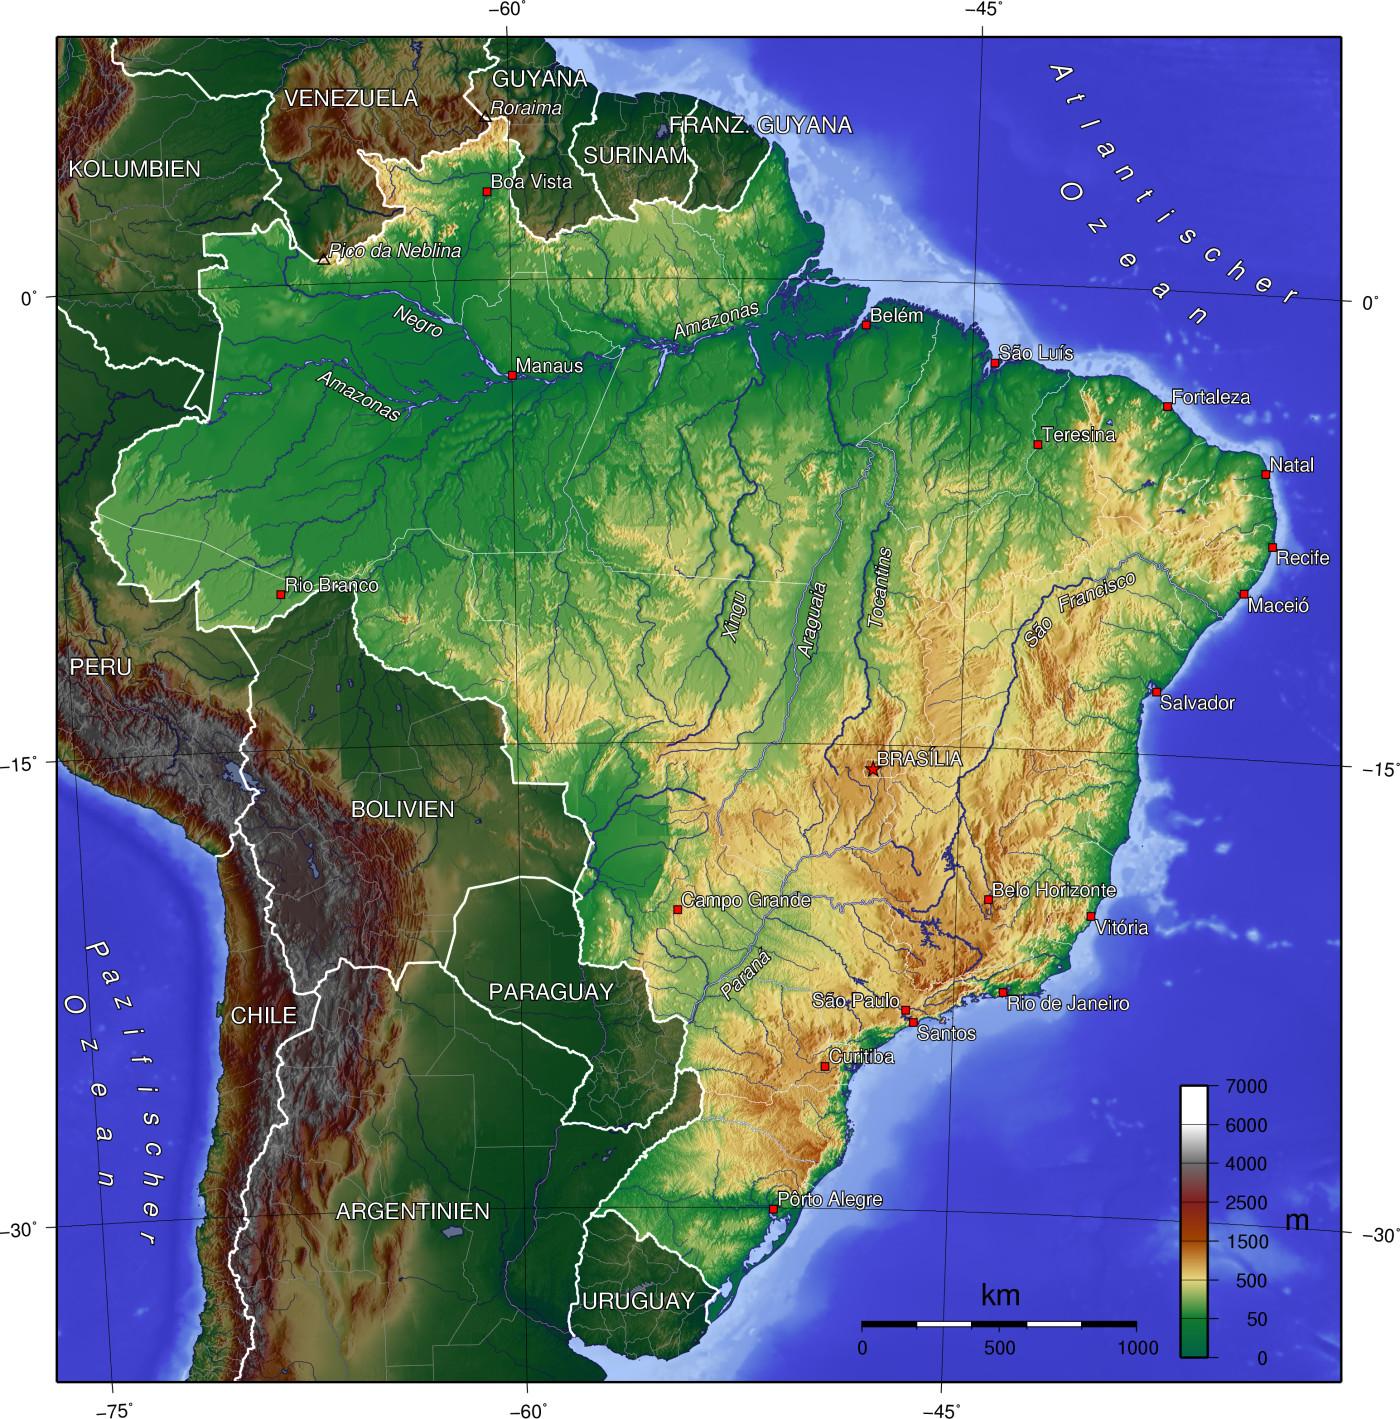 topographische karte brasilien Datei:Brasilien topo. – Wikipedia